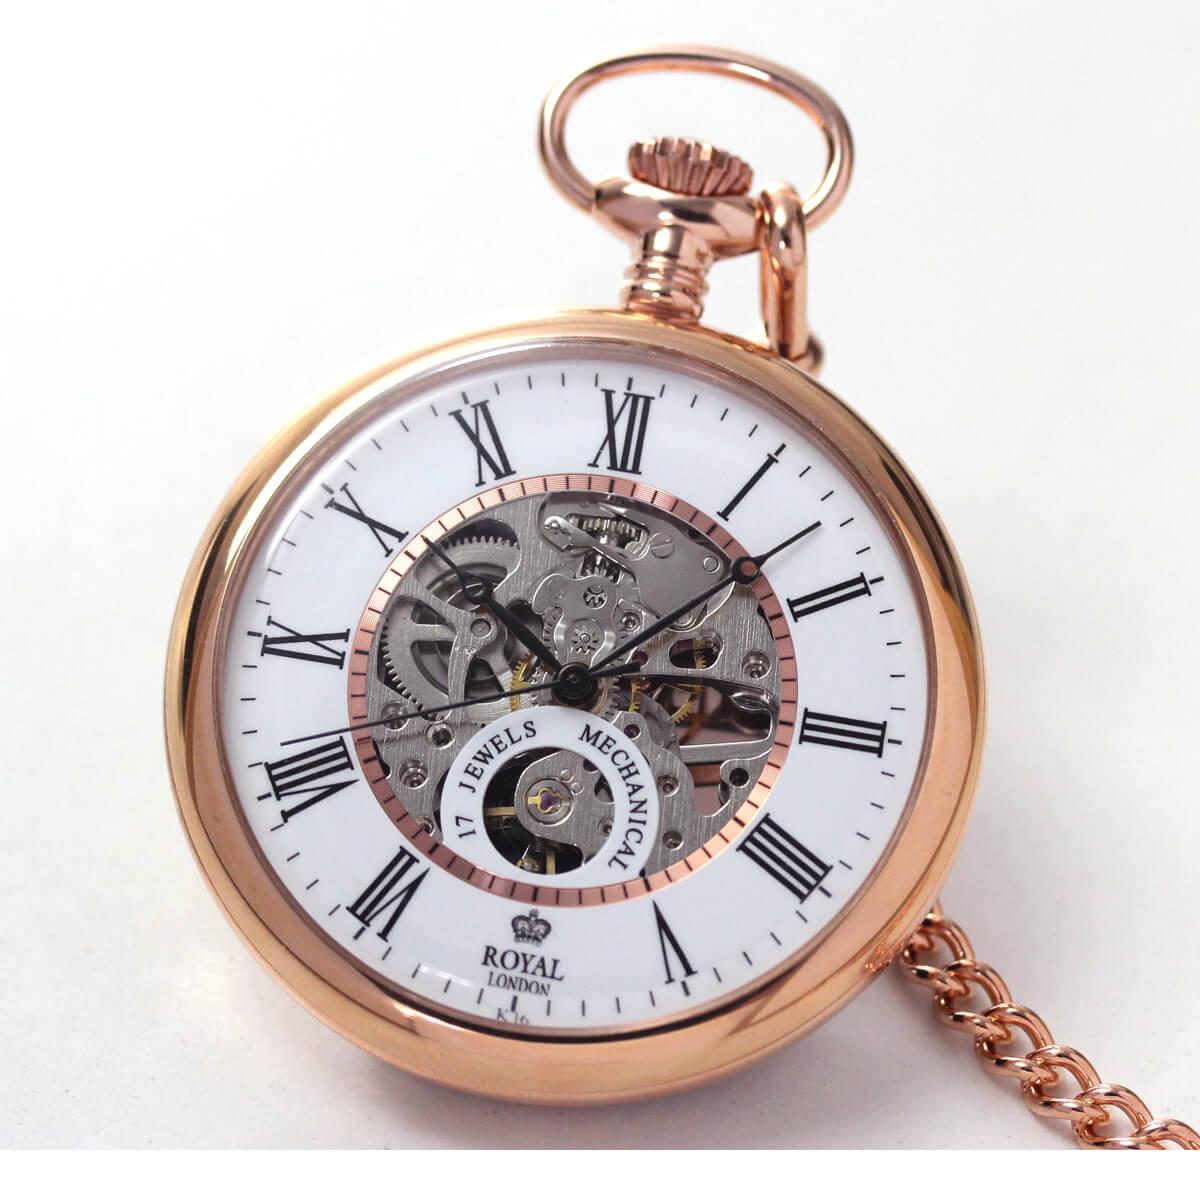 ROYAL LONDON(ロイヤルロンドン) 手巻きスケルトン懐中時計 90049-03